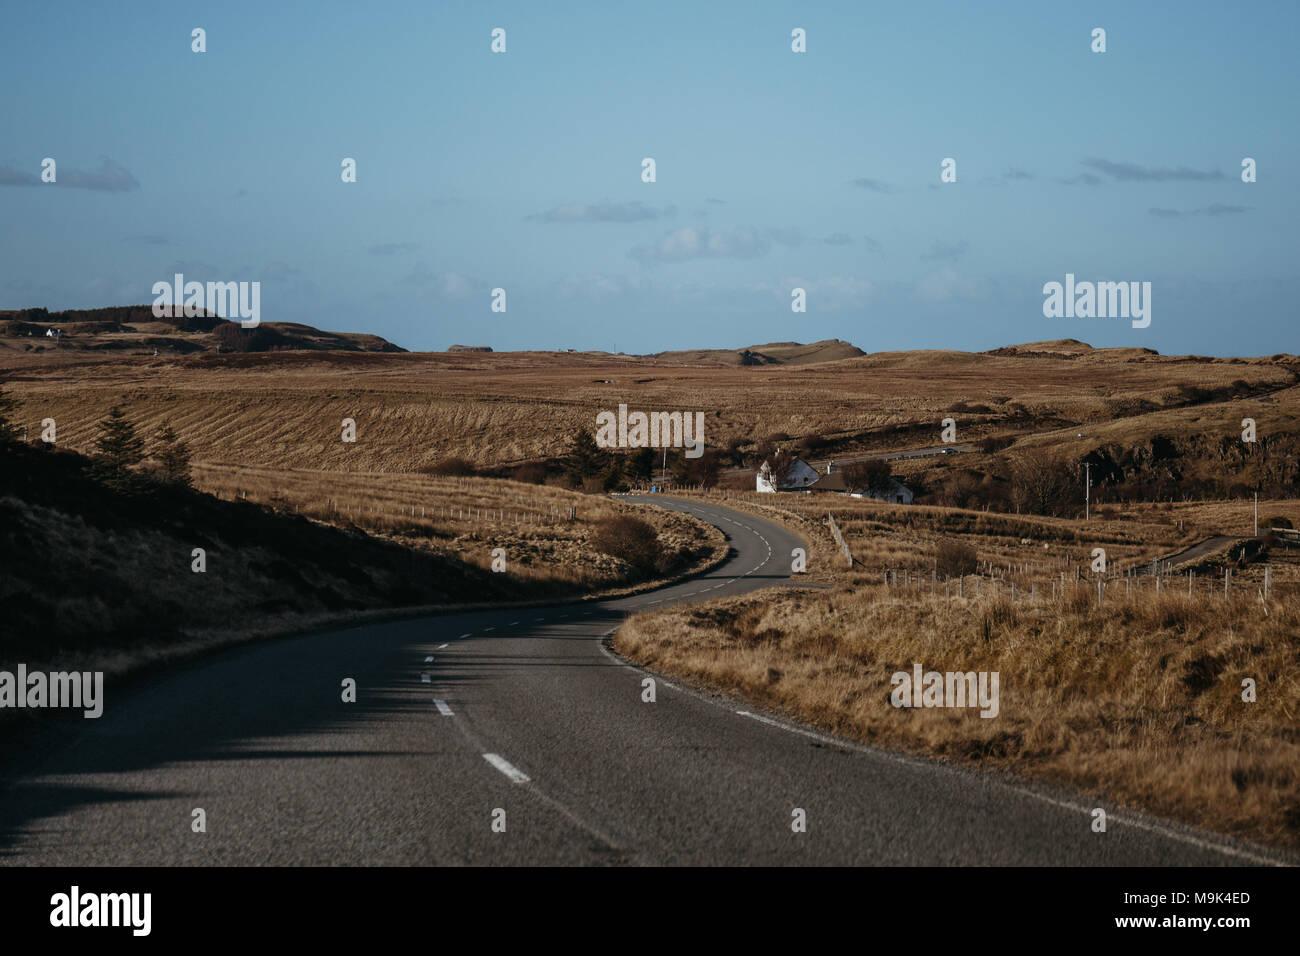 Road going through Isle of Skye, Scotland near Old Man of Storr. - Stock Image